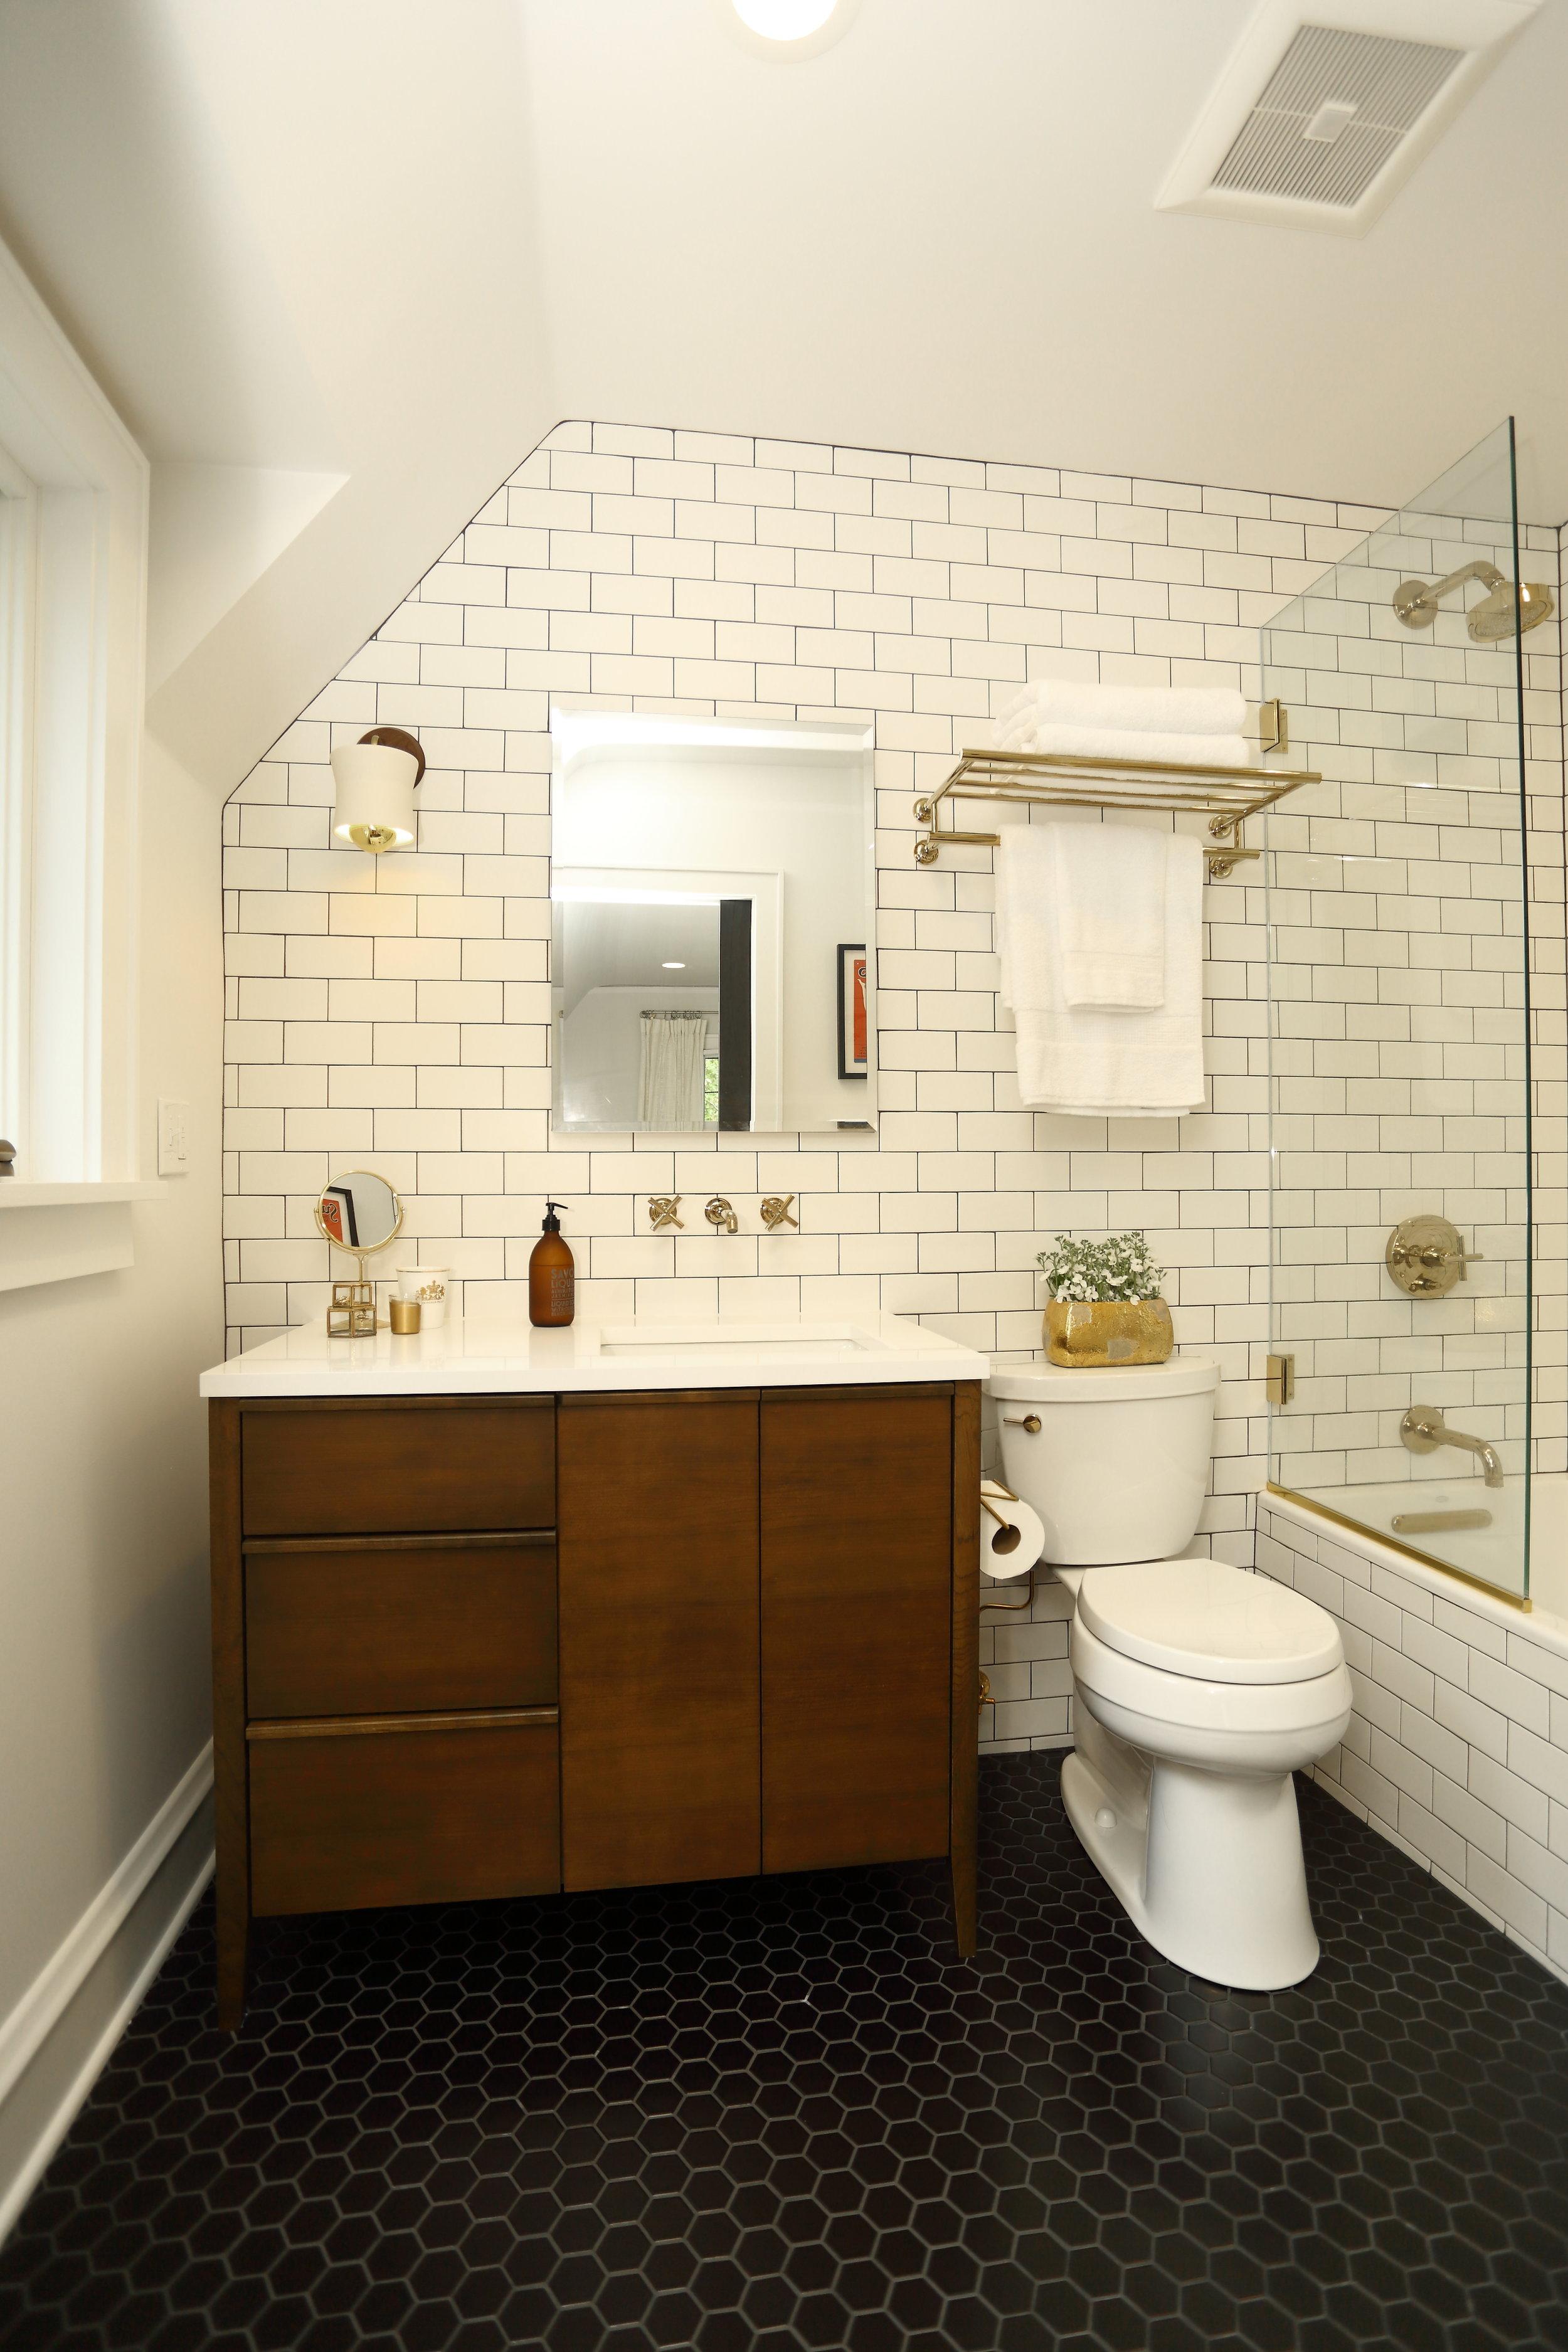 Master Bathroom Bedroom AFTER 2.JPG